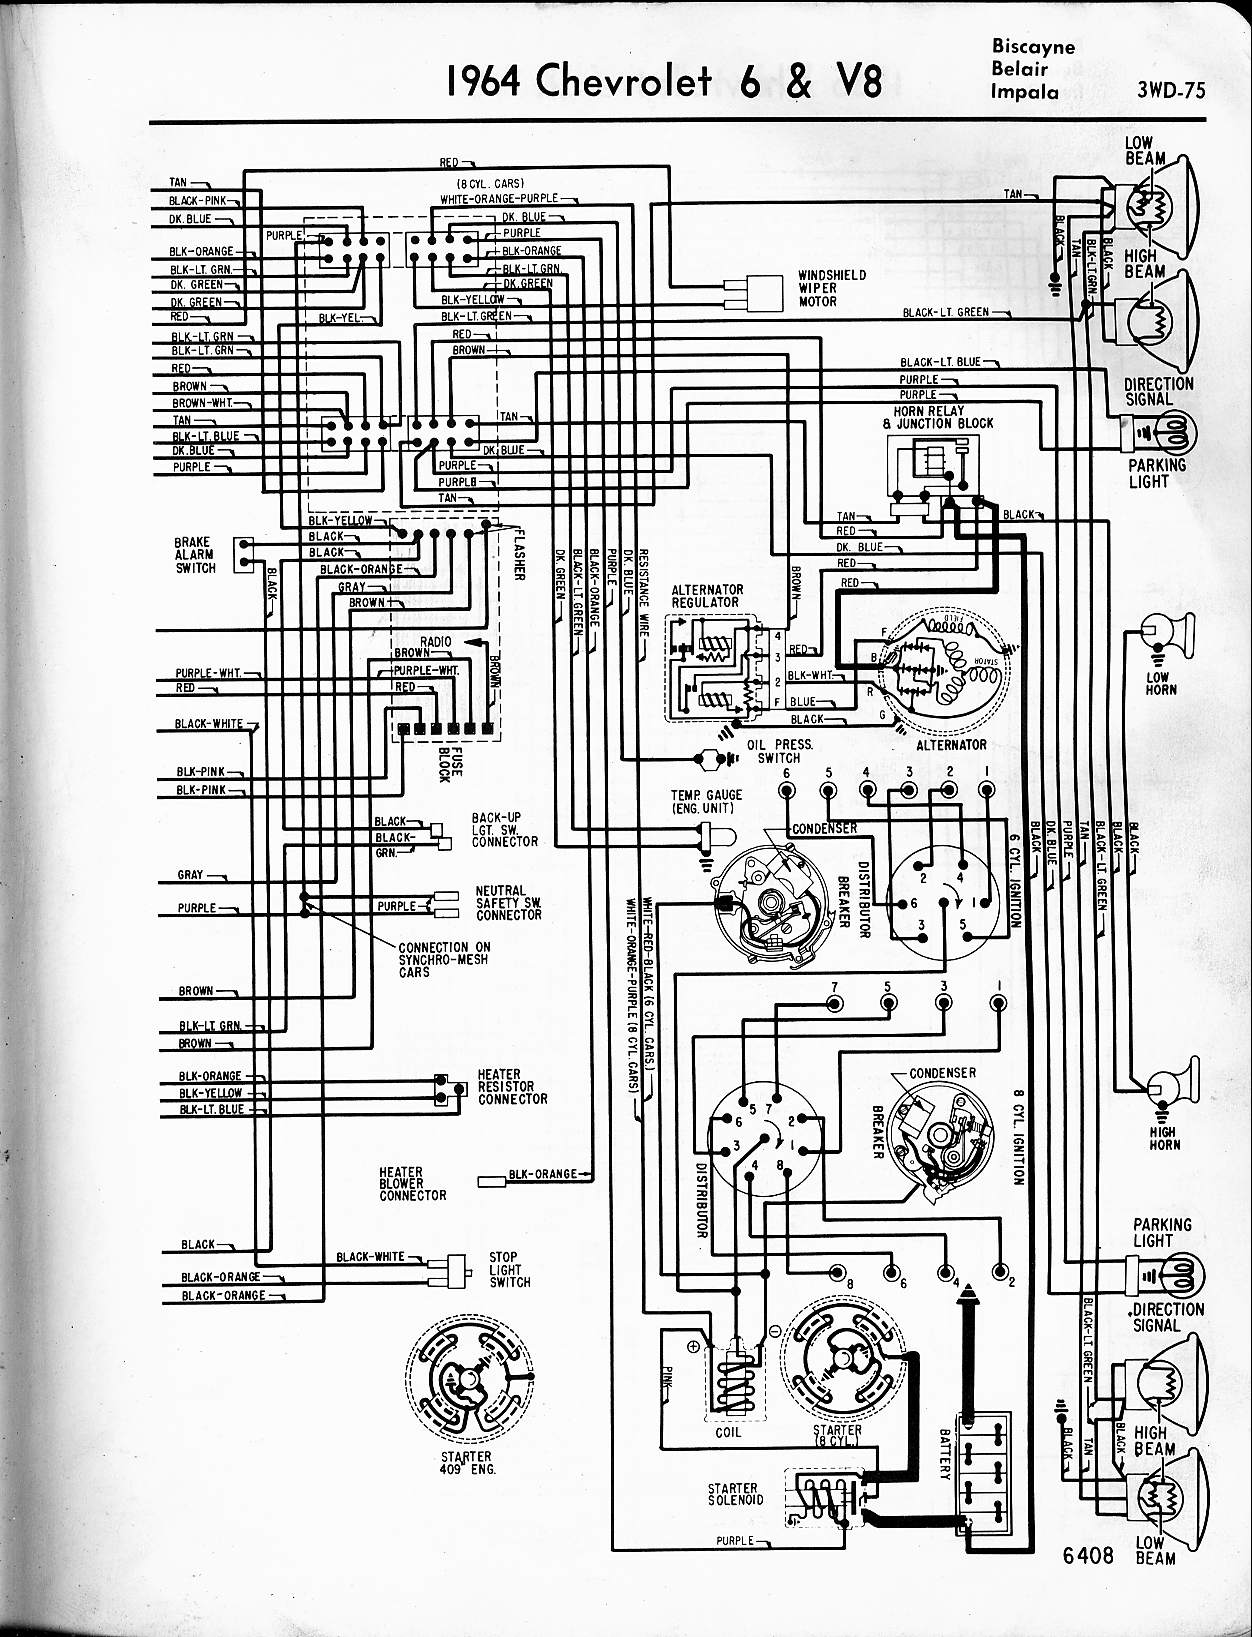 Chevy Nova Wiring Diagram | eStrategyS.co